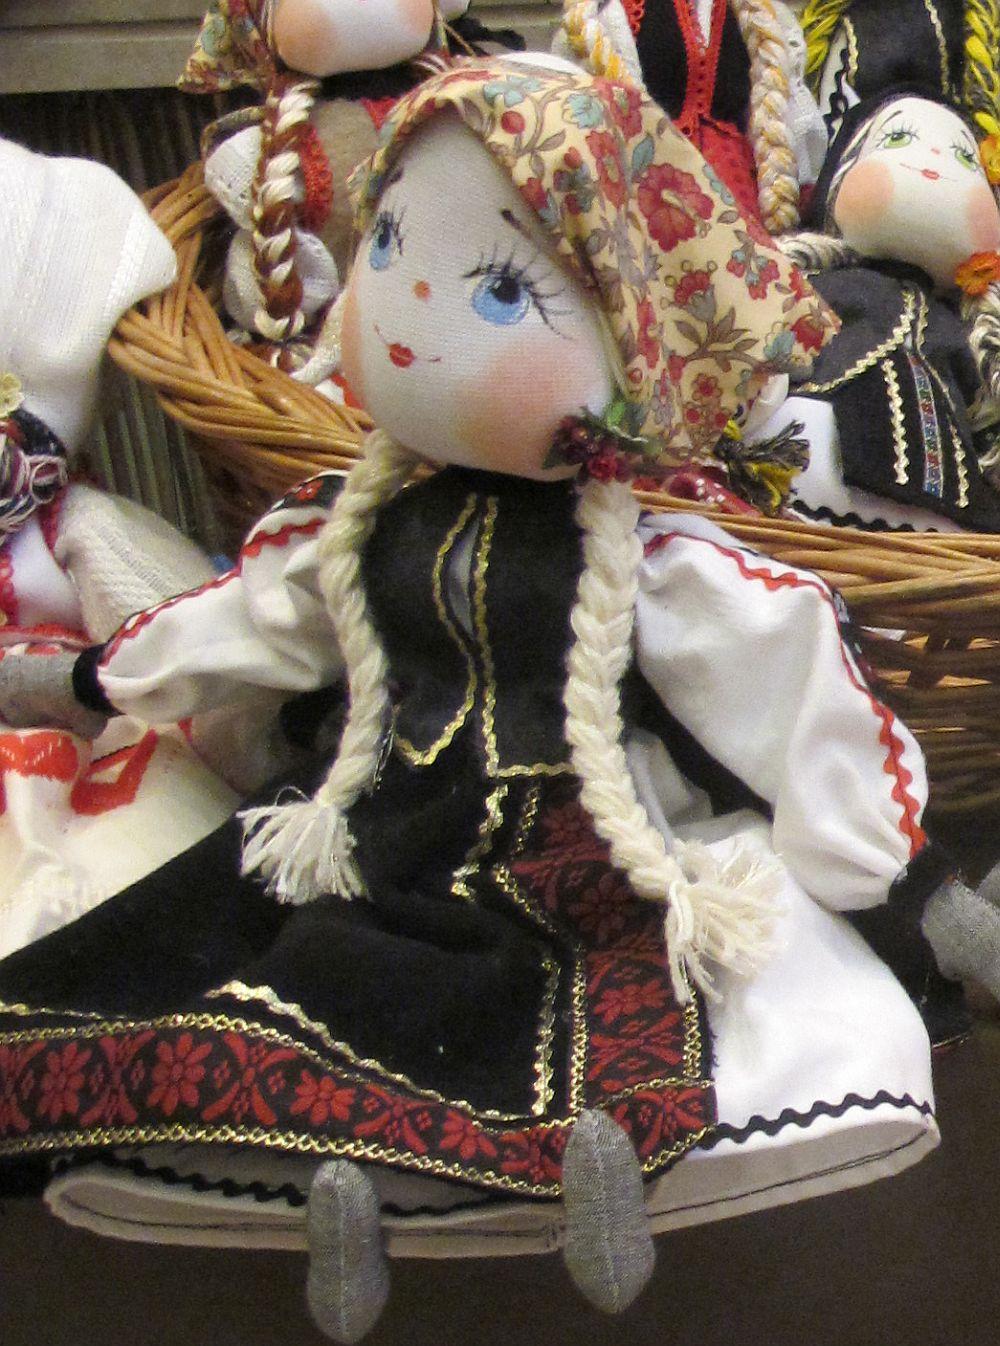 adelaparvu.com about Doina Nistor dolls artisan (8)